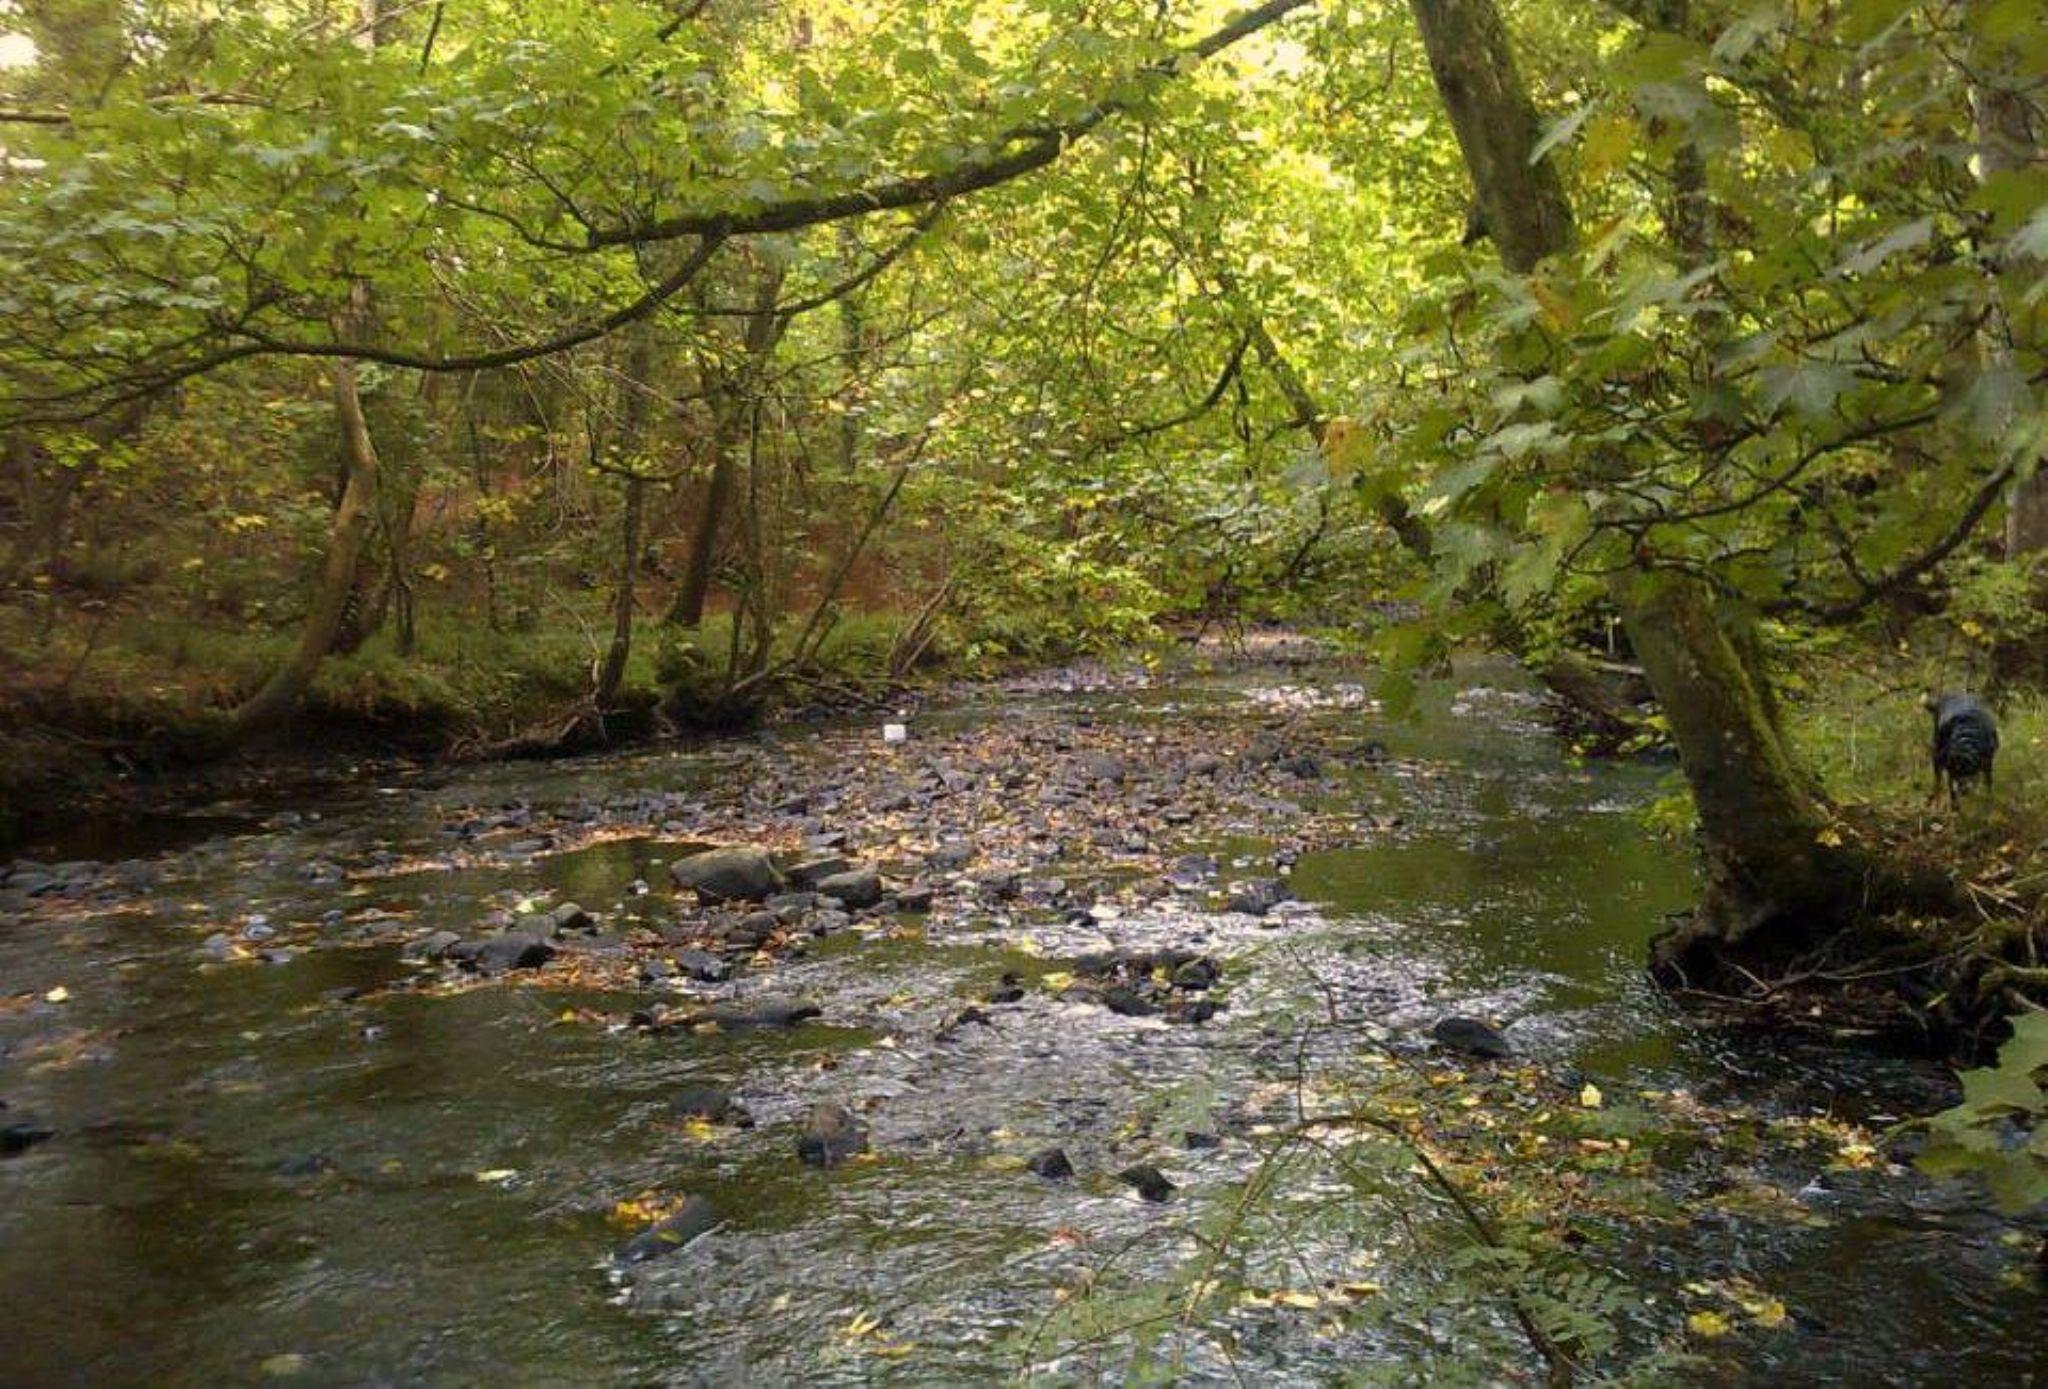 river aeron by chris.adams.3557